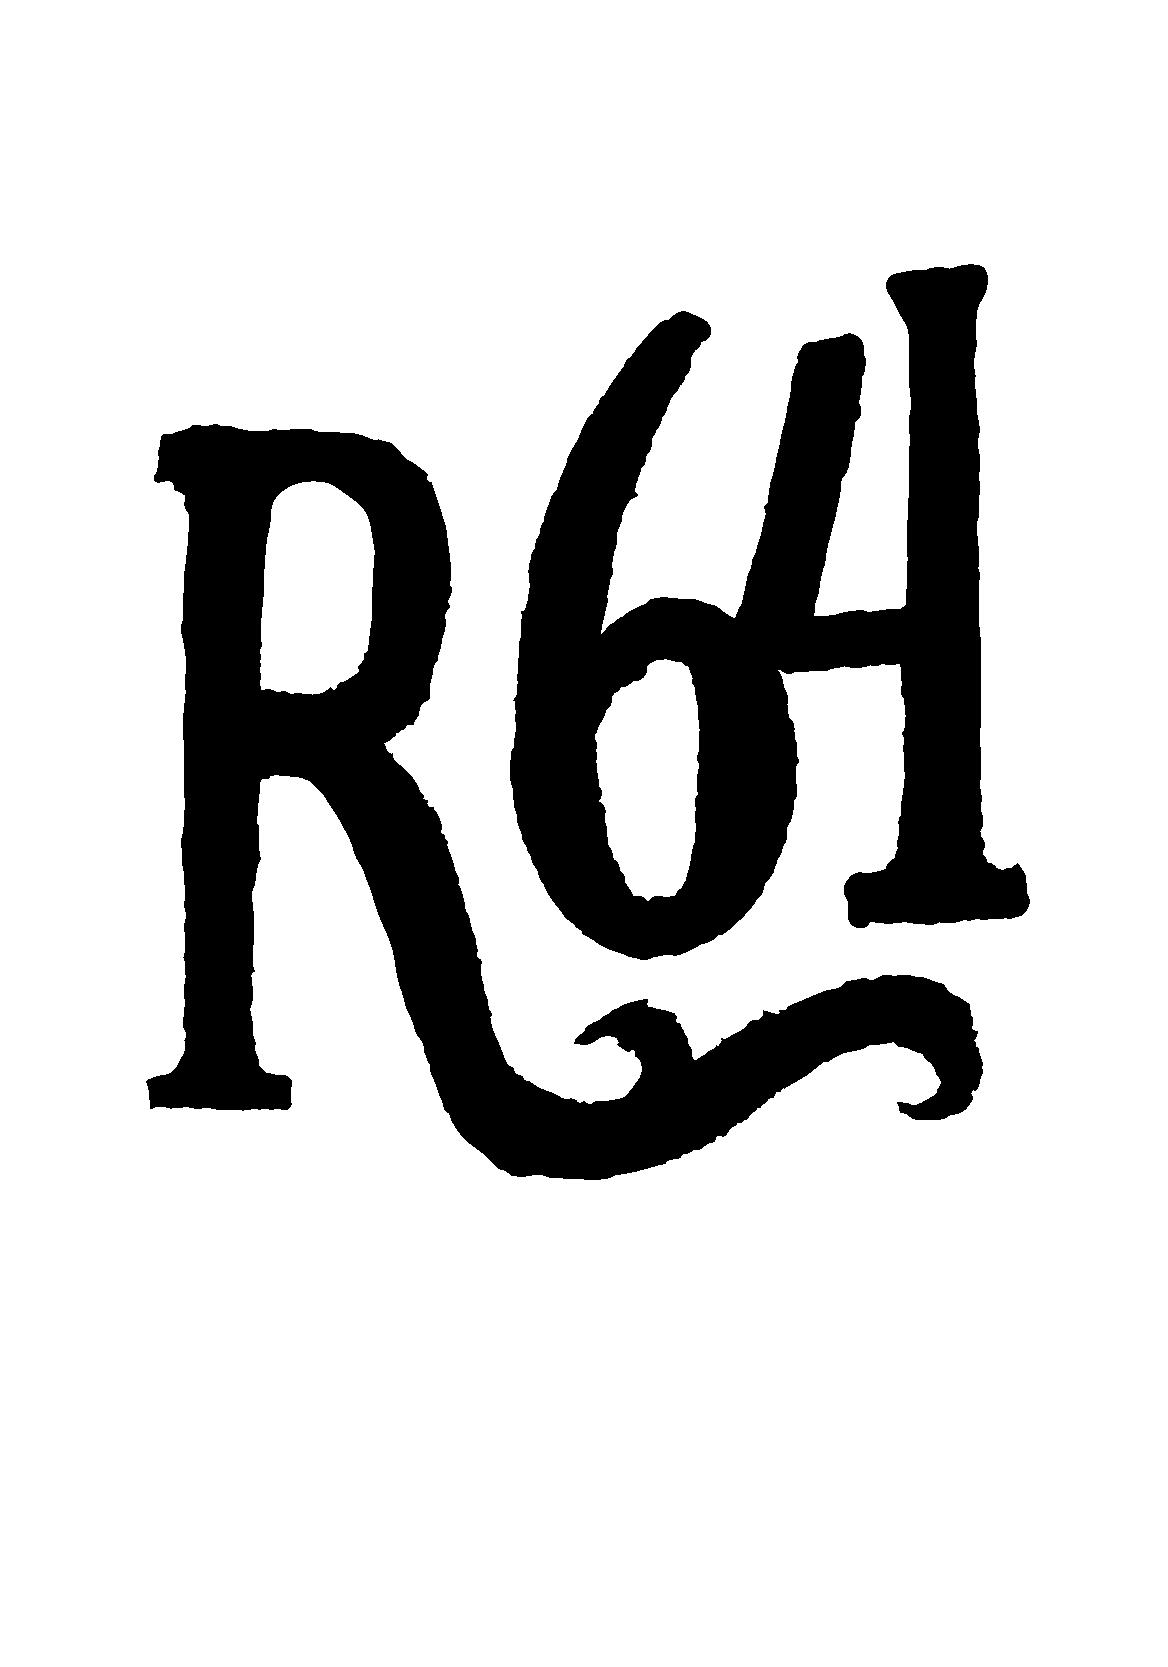 root64logo_01ab.png